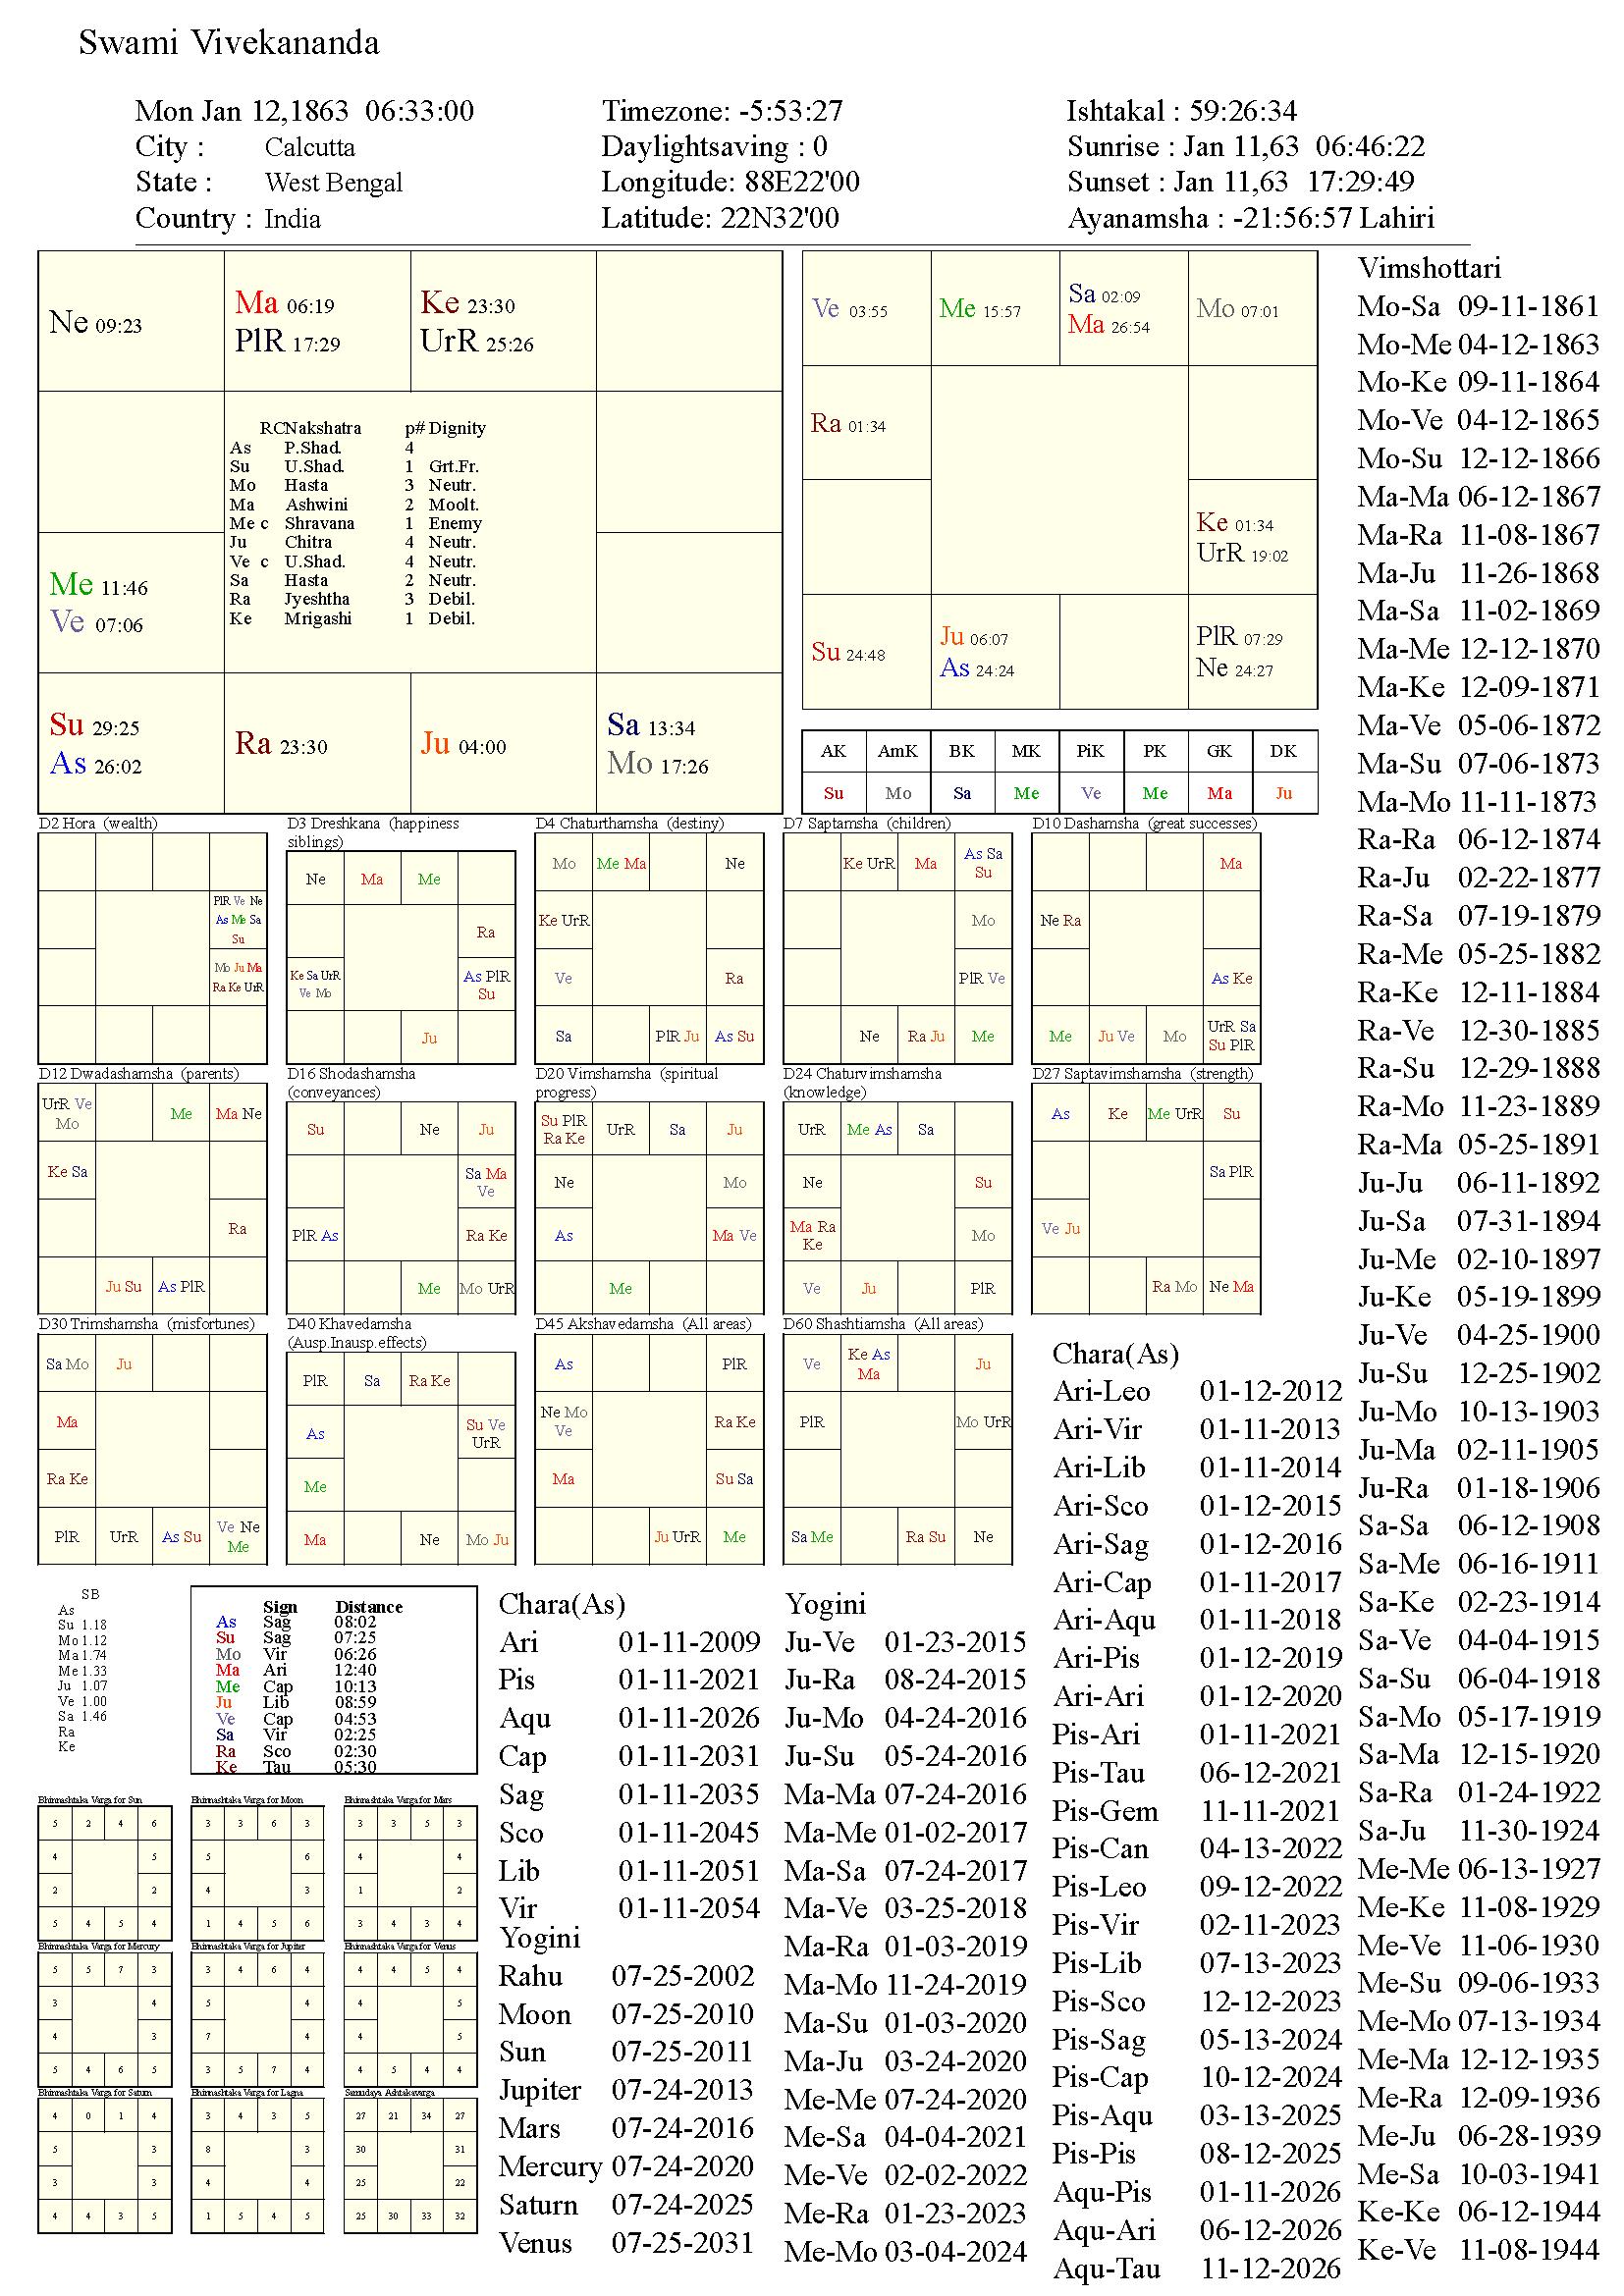 SwamiVivekananda_chart